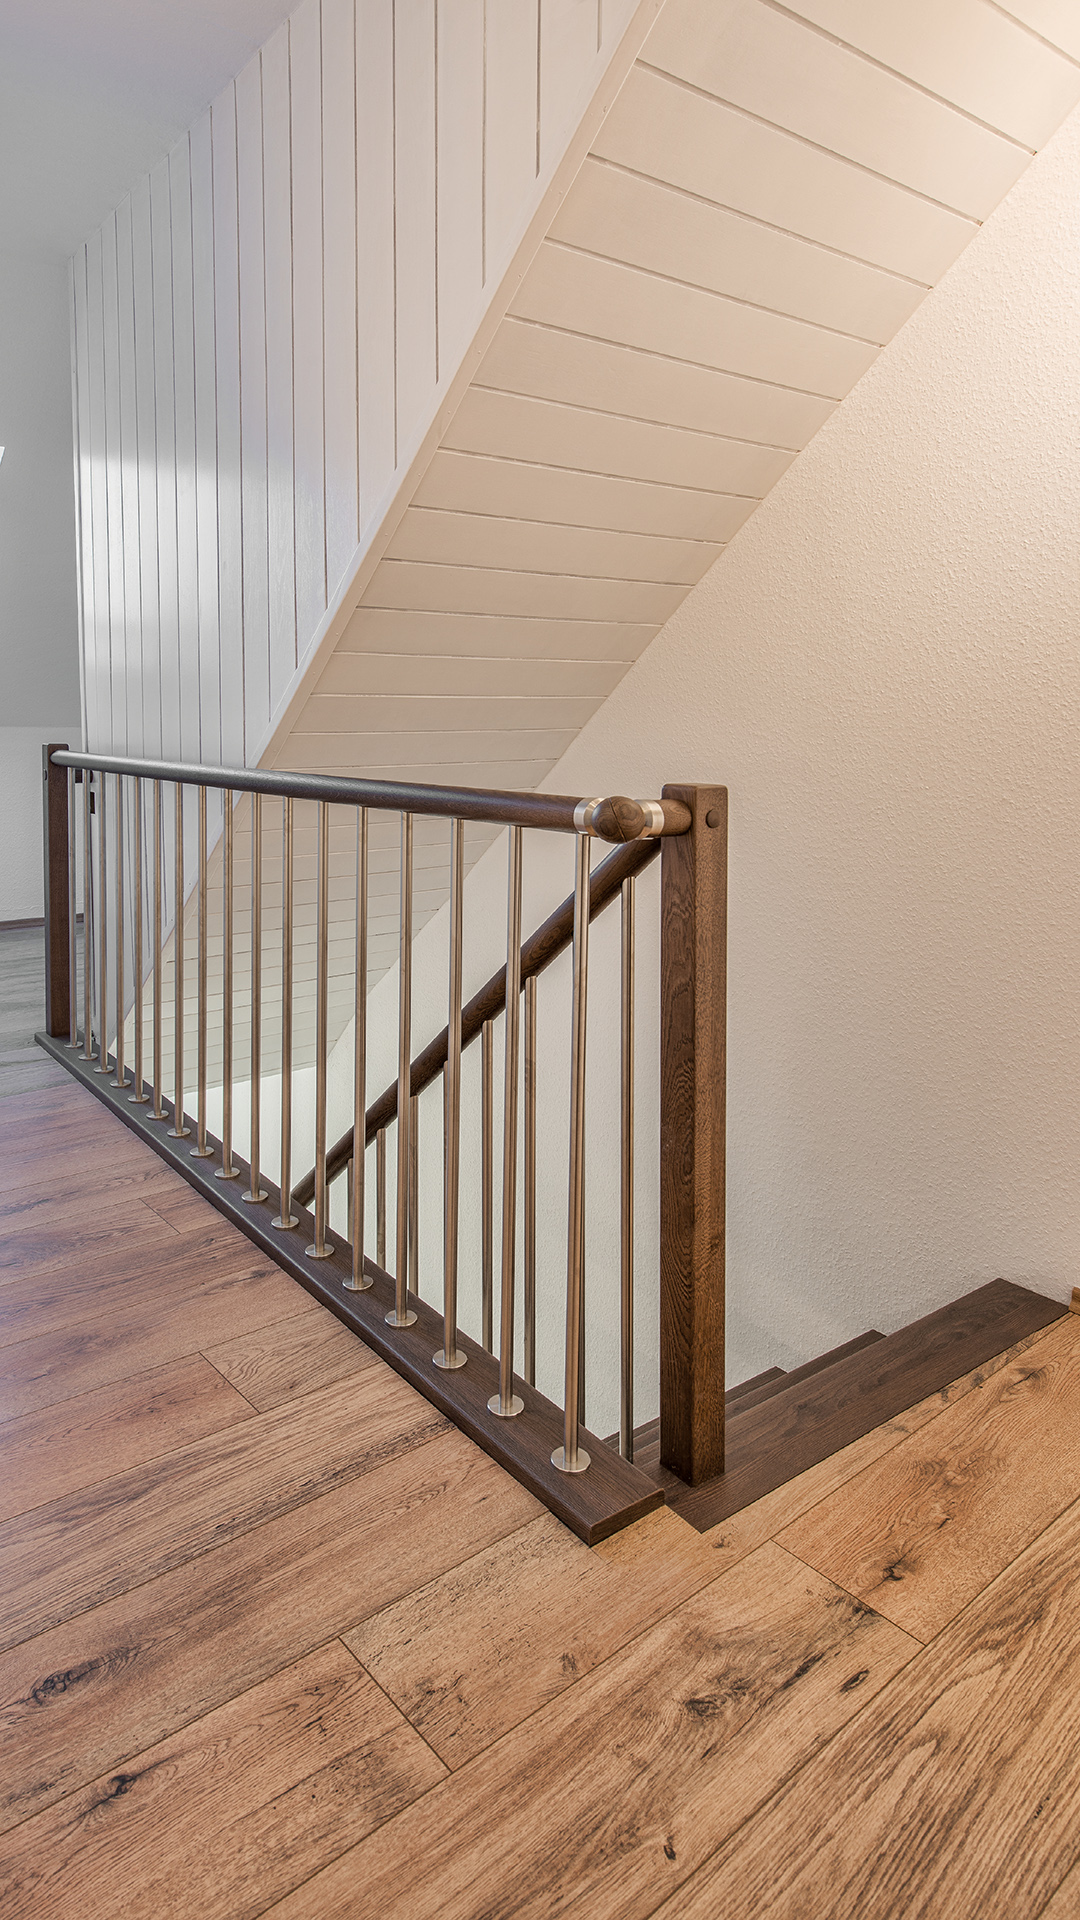 Galerien Treppenrenovierung Kenngott Kenngott Treppen